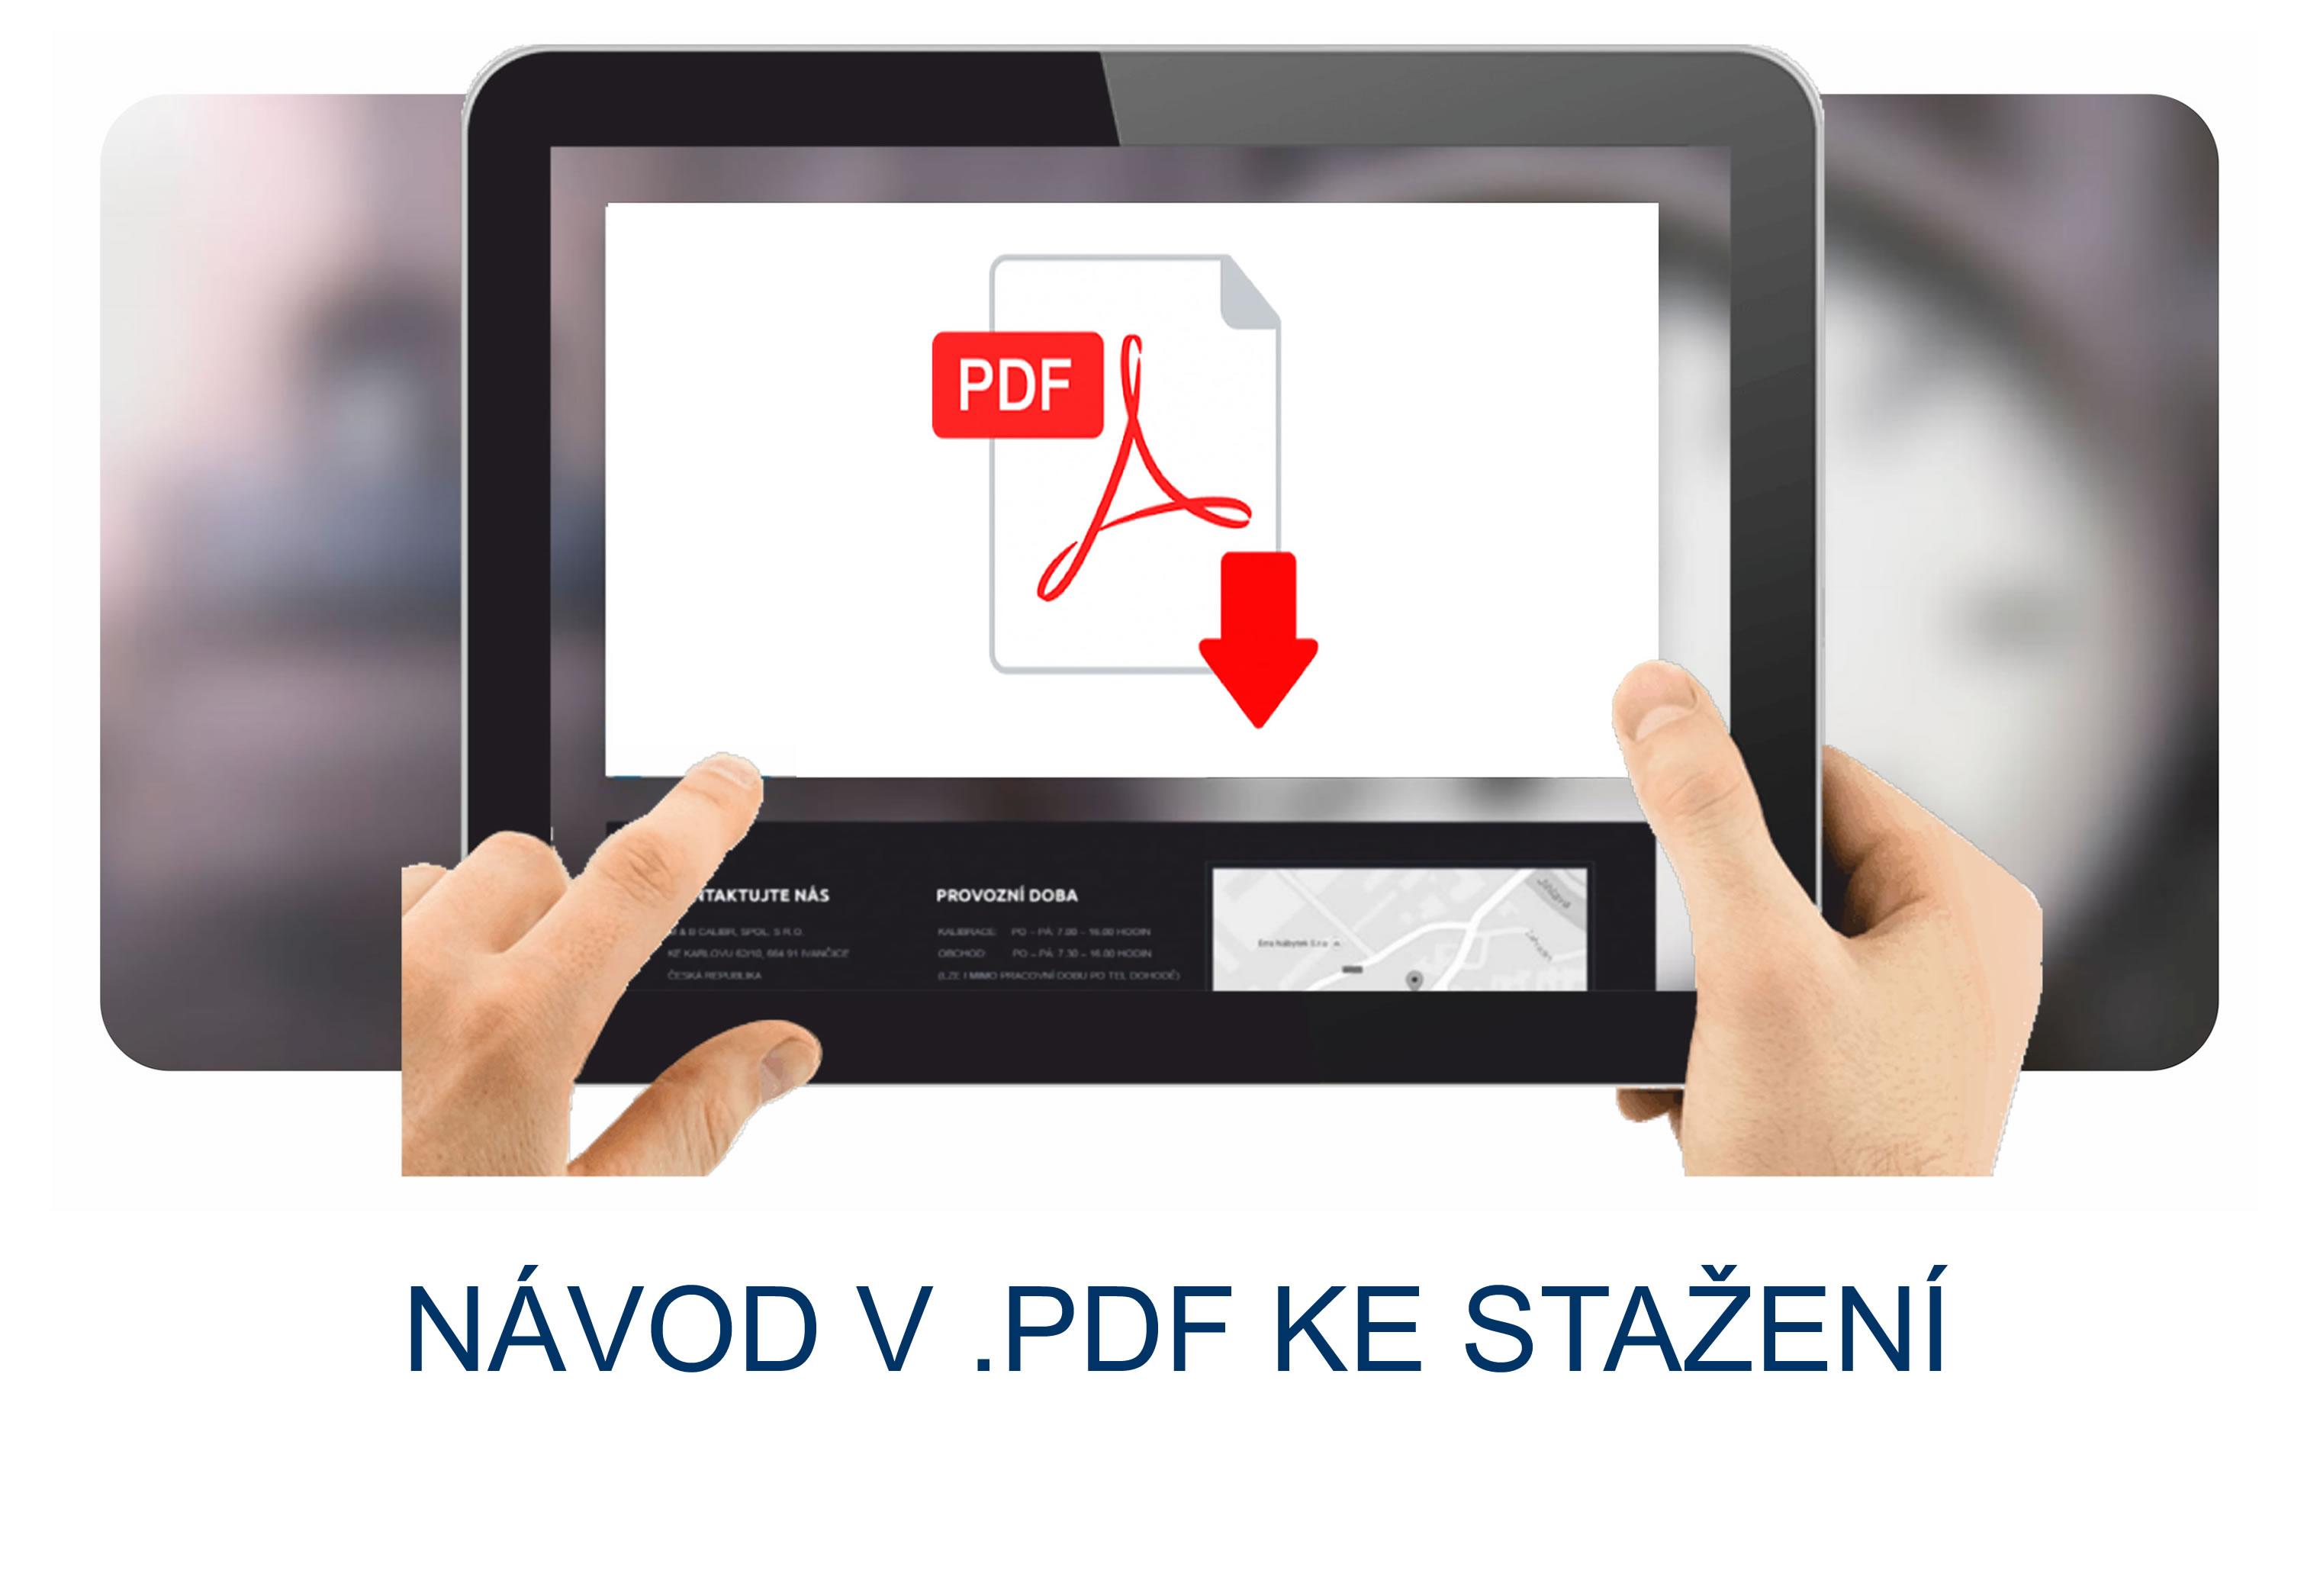 navod_pdf_na_web_finral.jpg